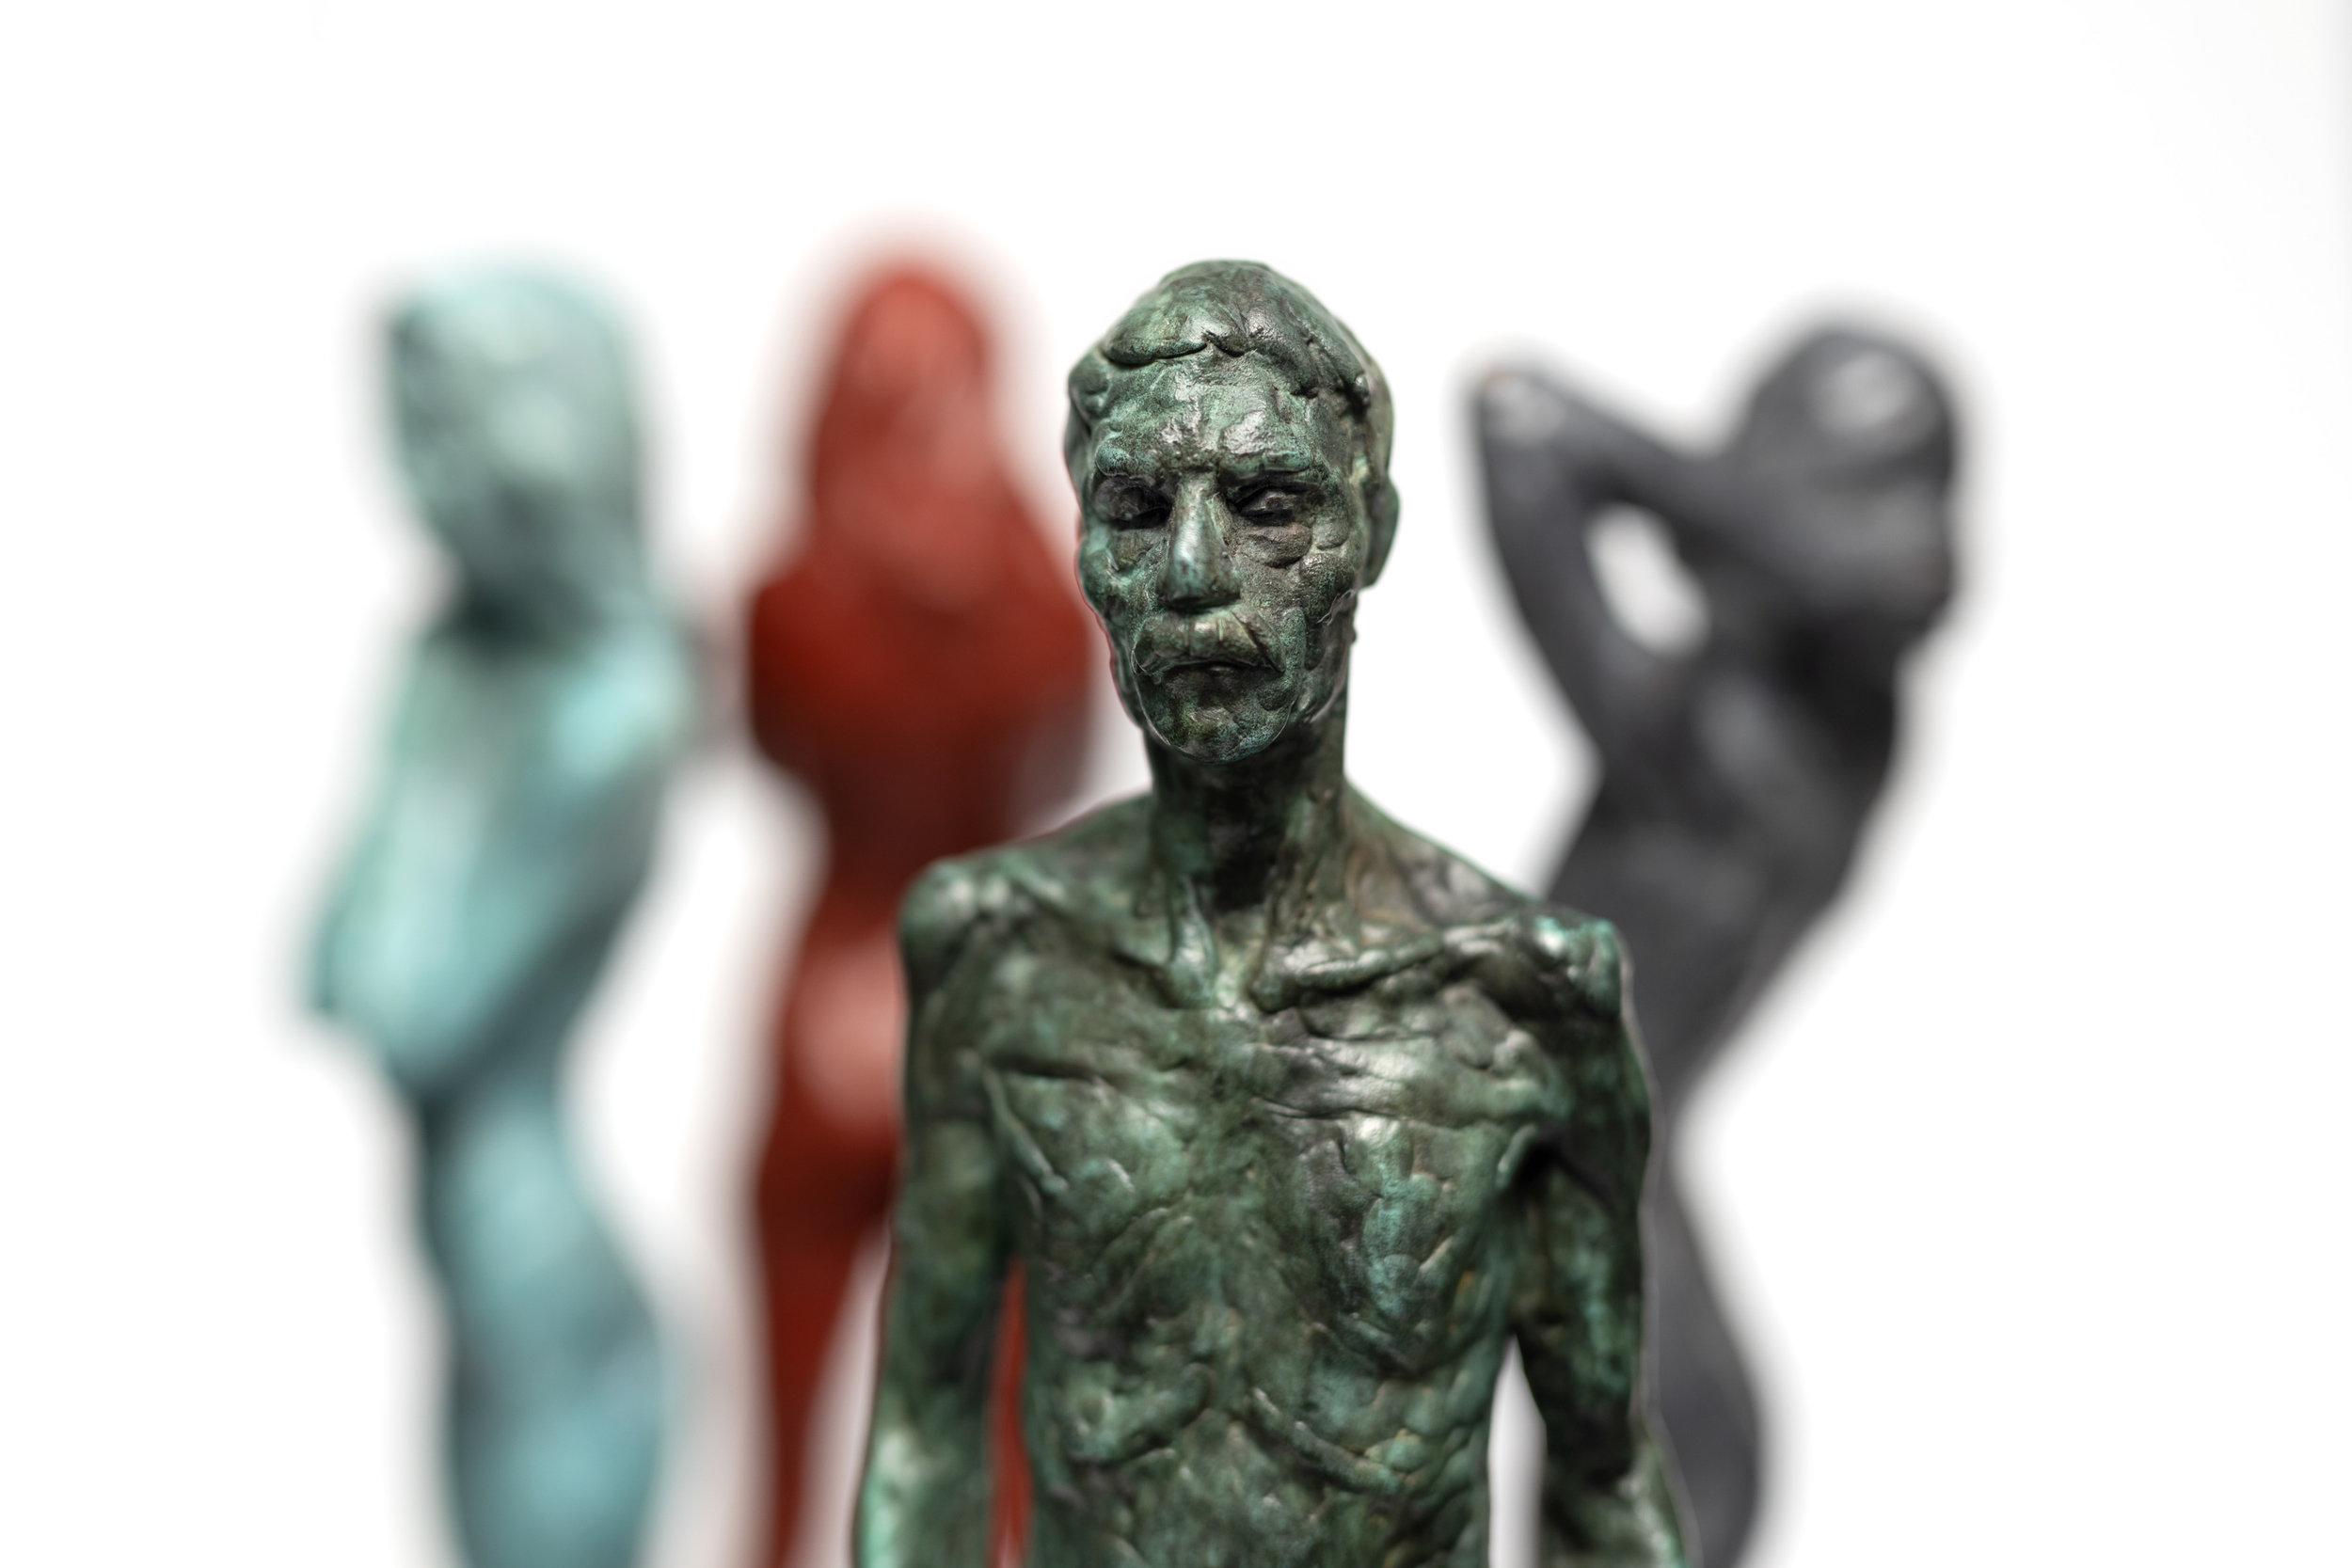 mf-figure-group-bronze-008.jpg